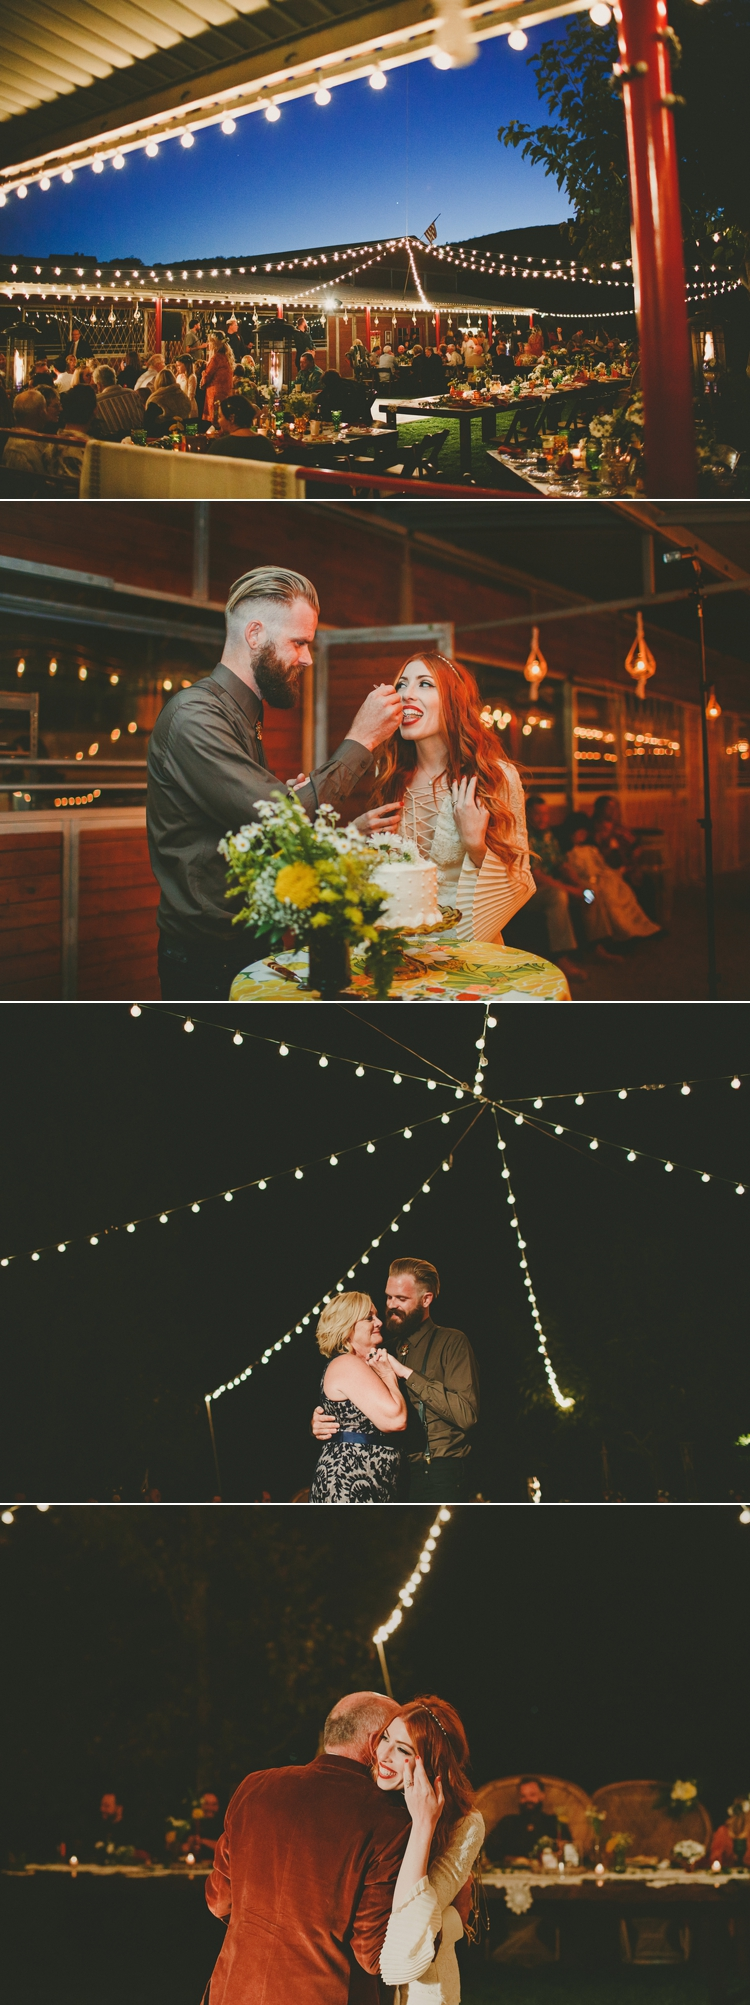 woodstock-inspired-wedding-photos-33